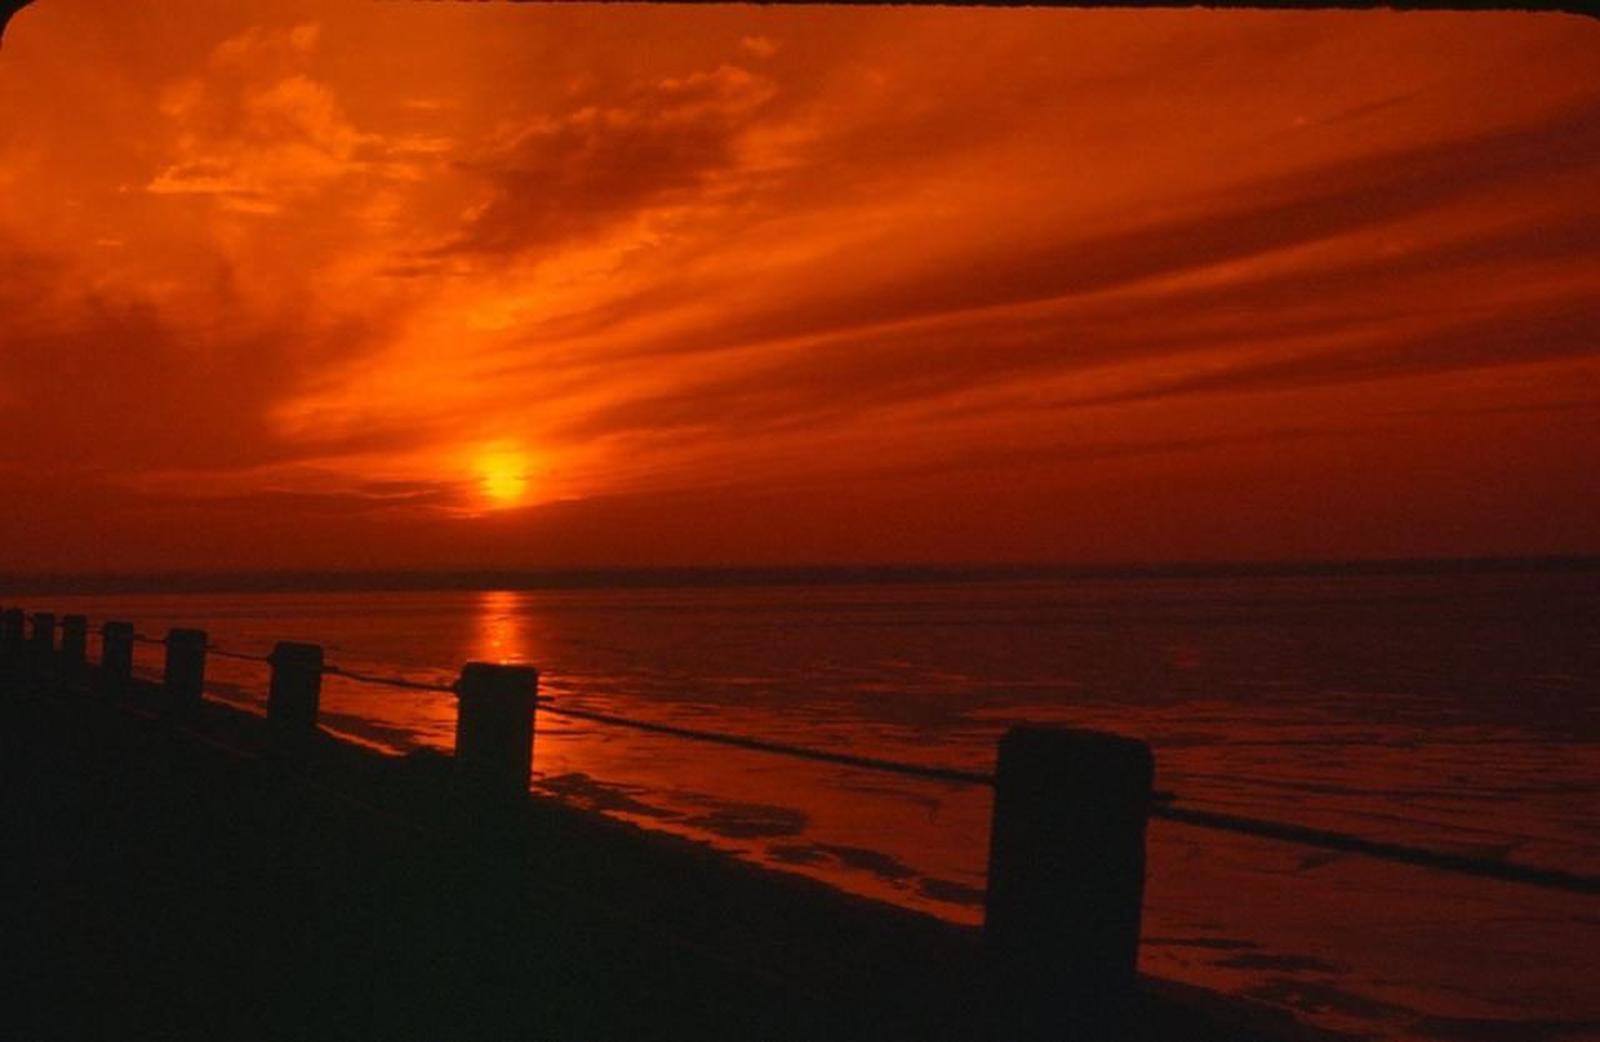 sunset with shoreline